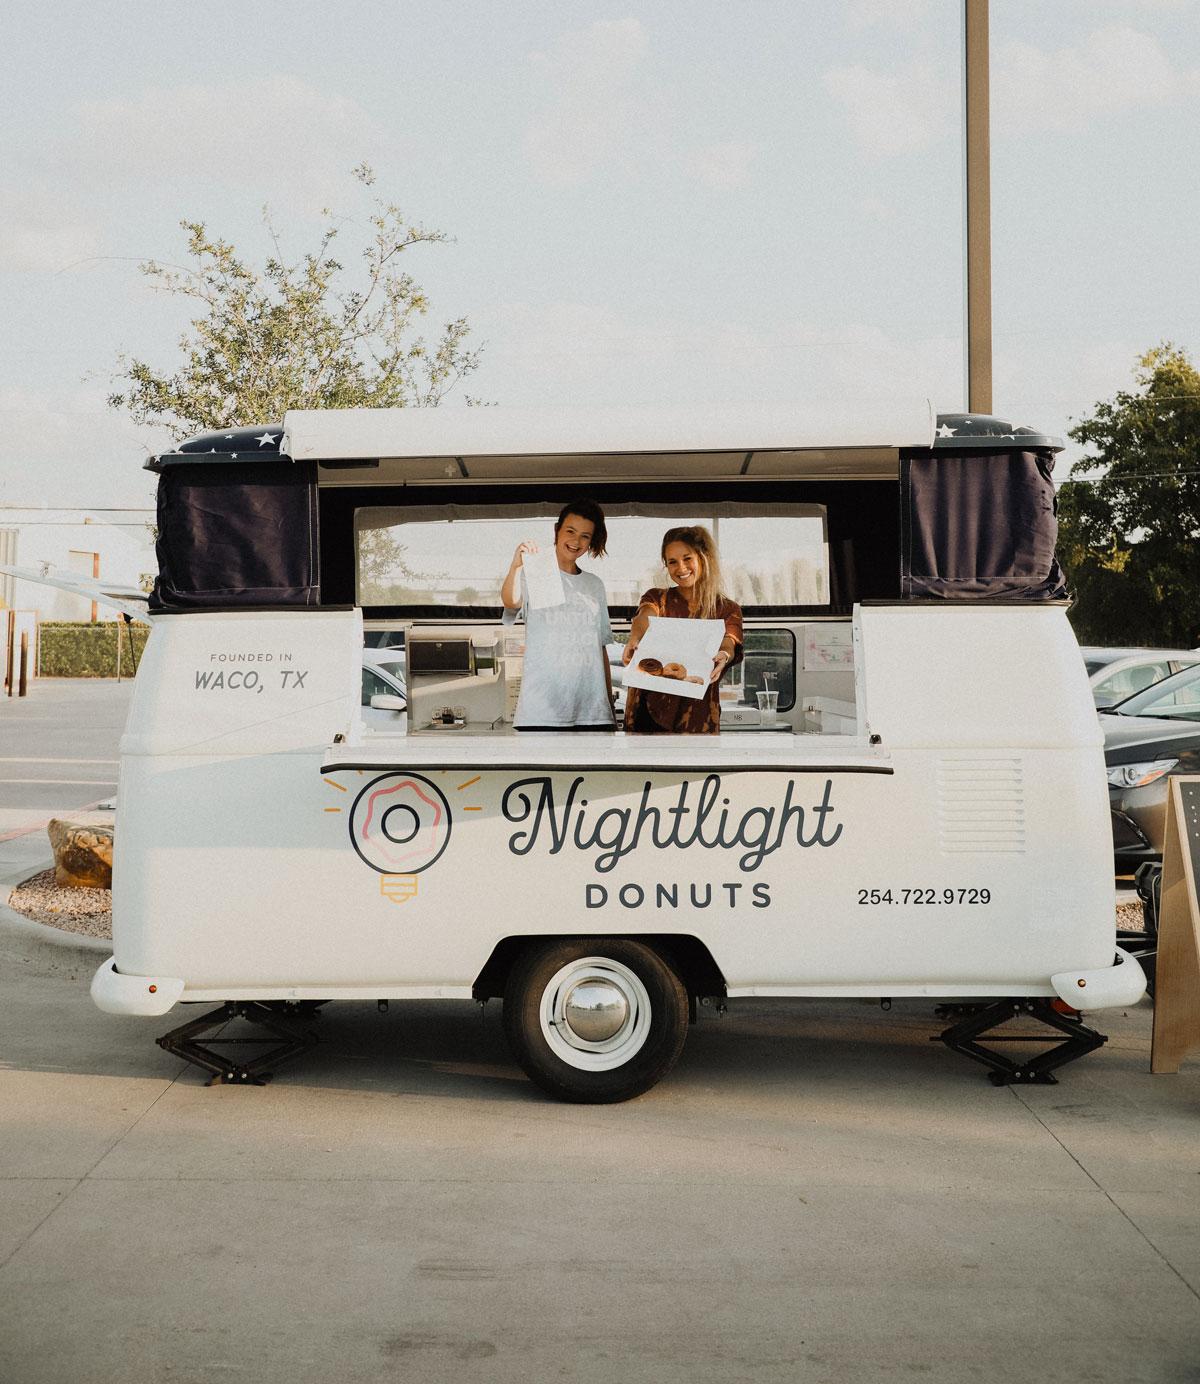 Nightlight Donuts & Coffee Food Truck